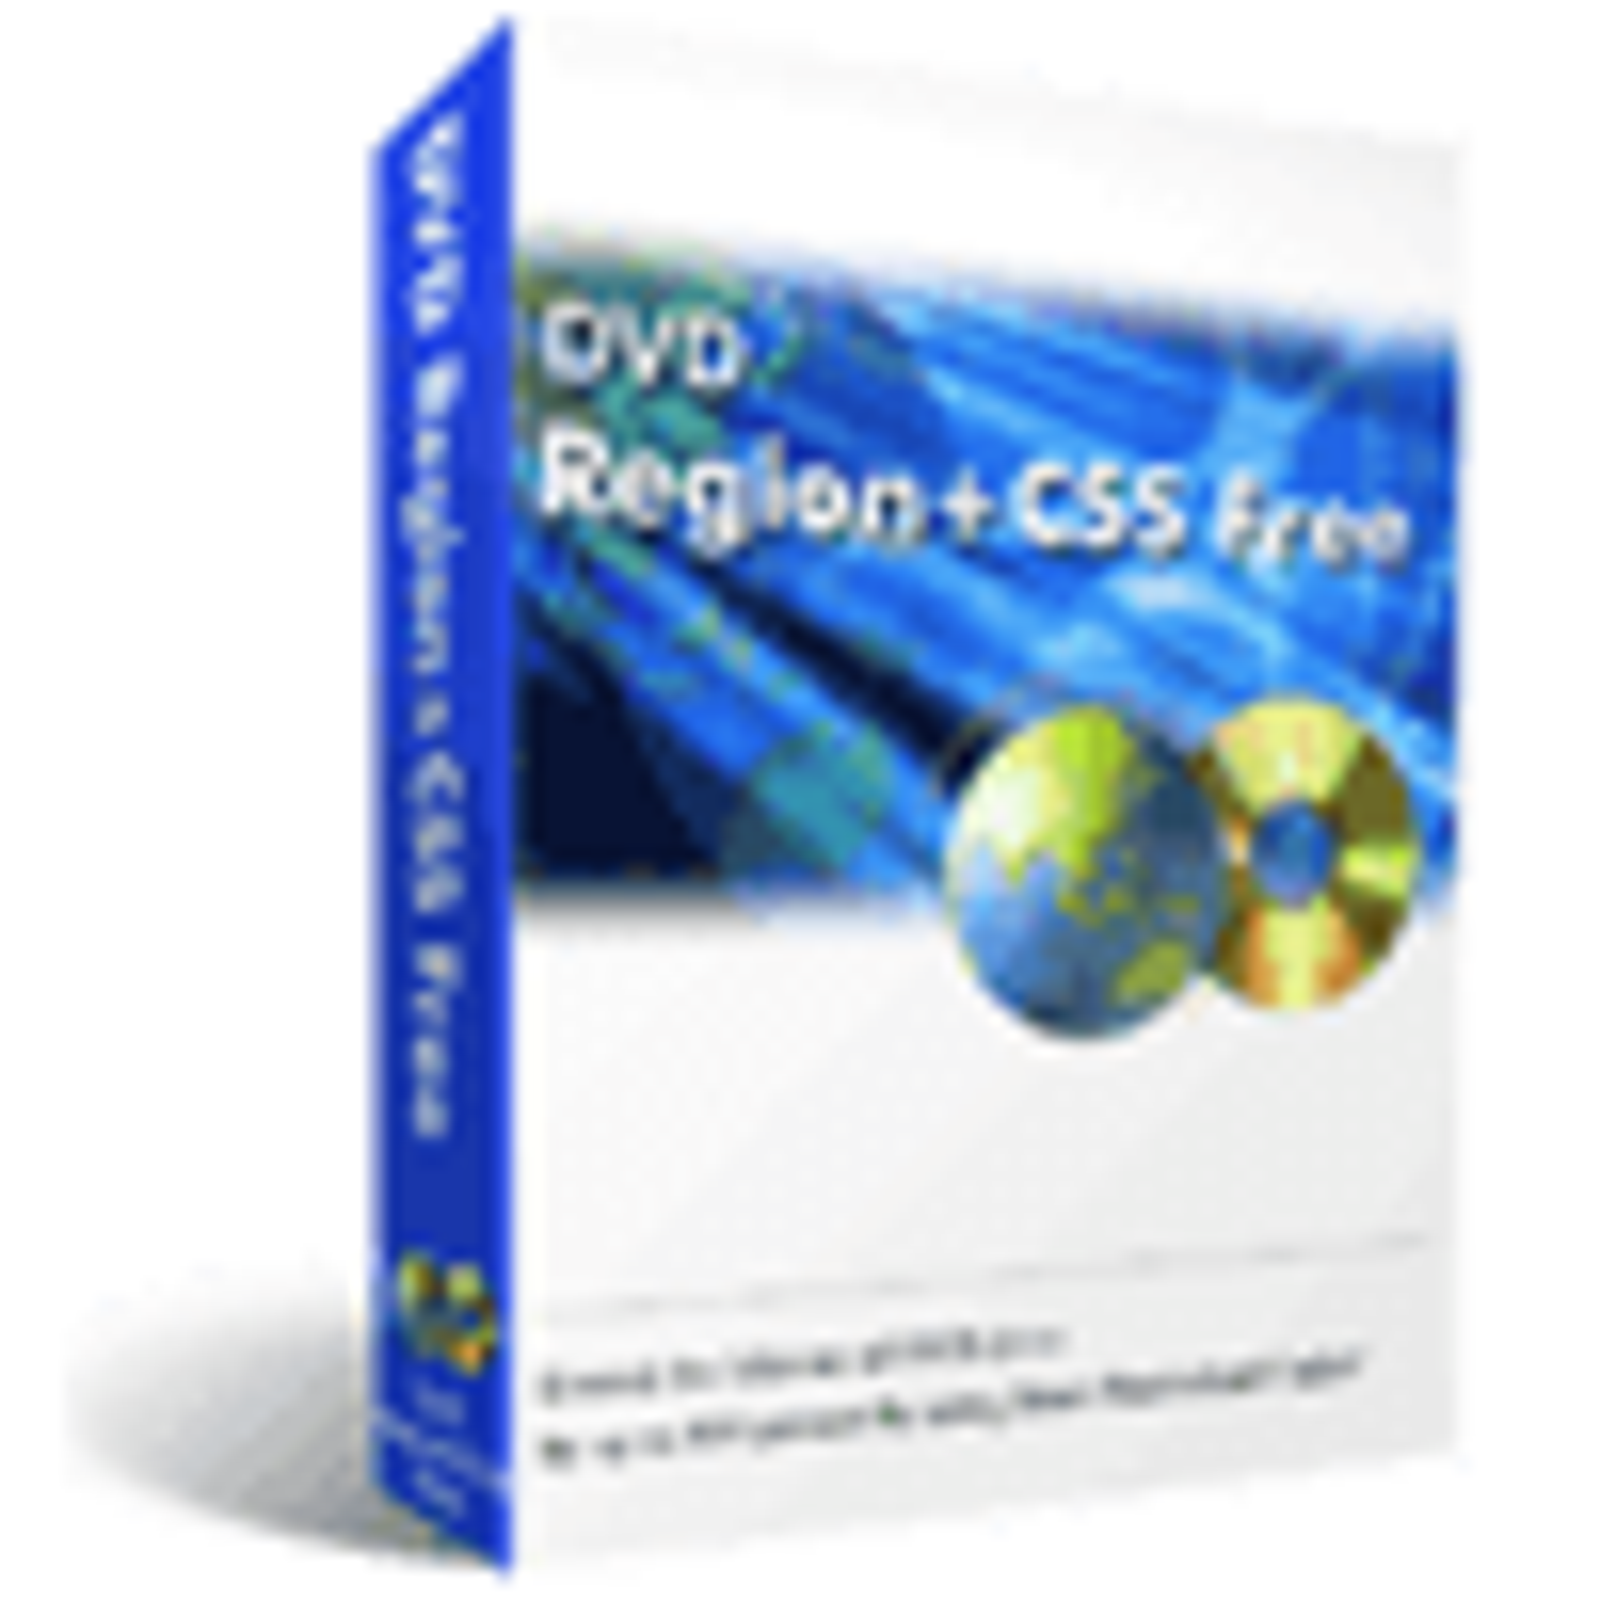 DVD Region+CSS Free